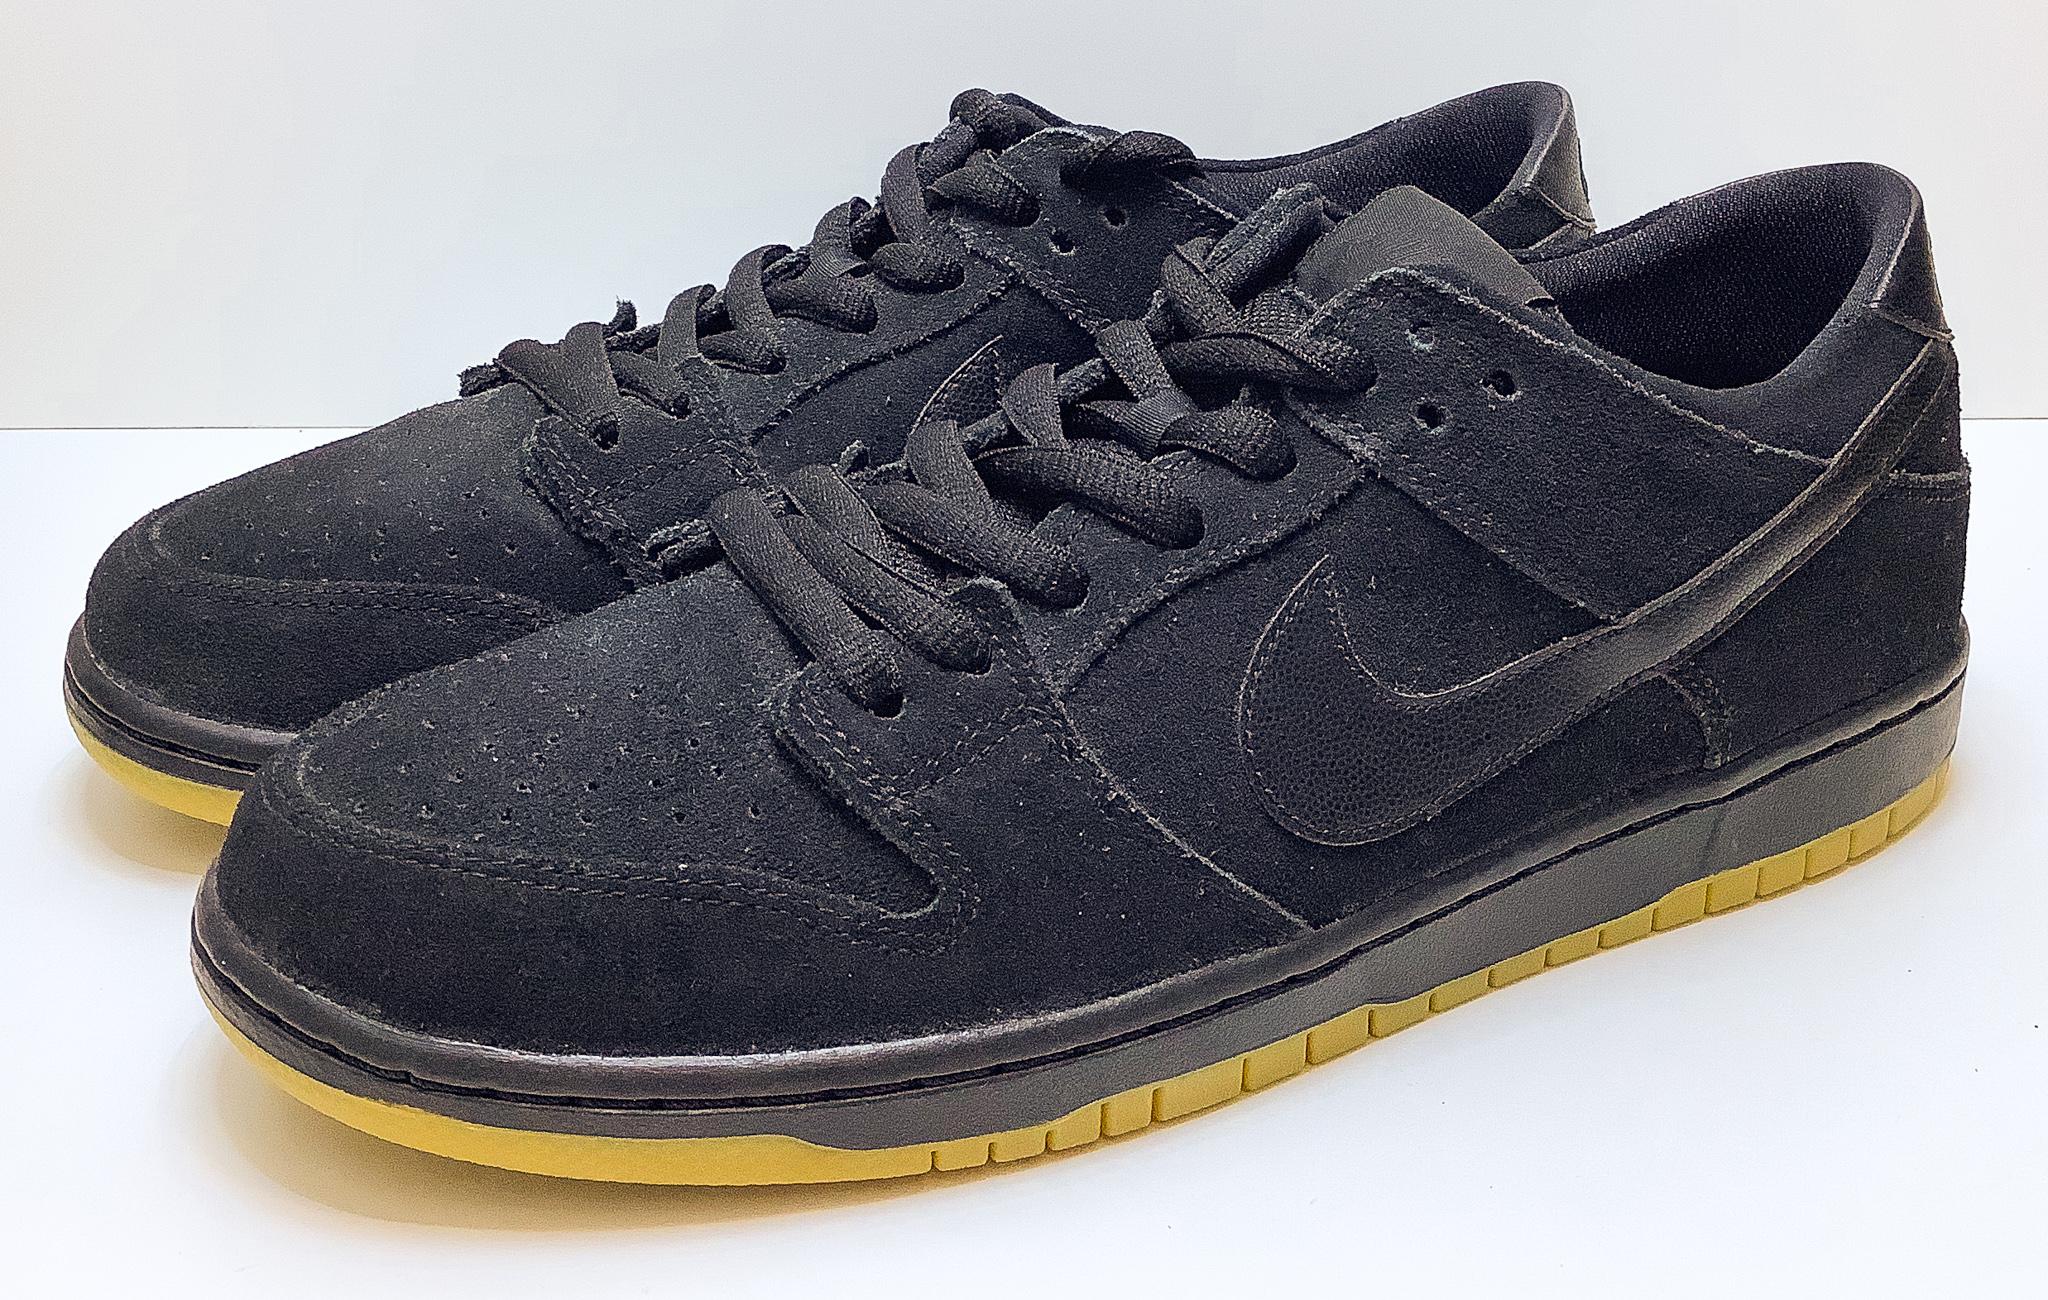 Nike SB Dunk Low IW Black Gum